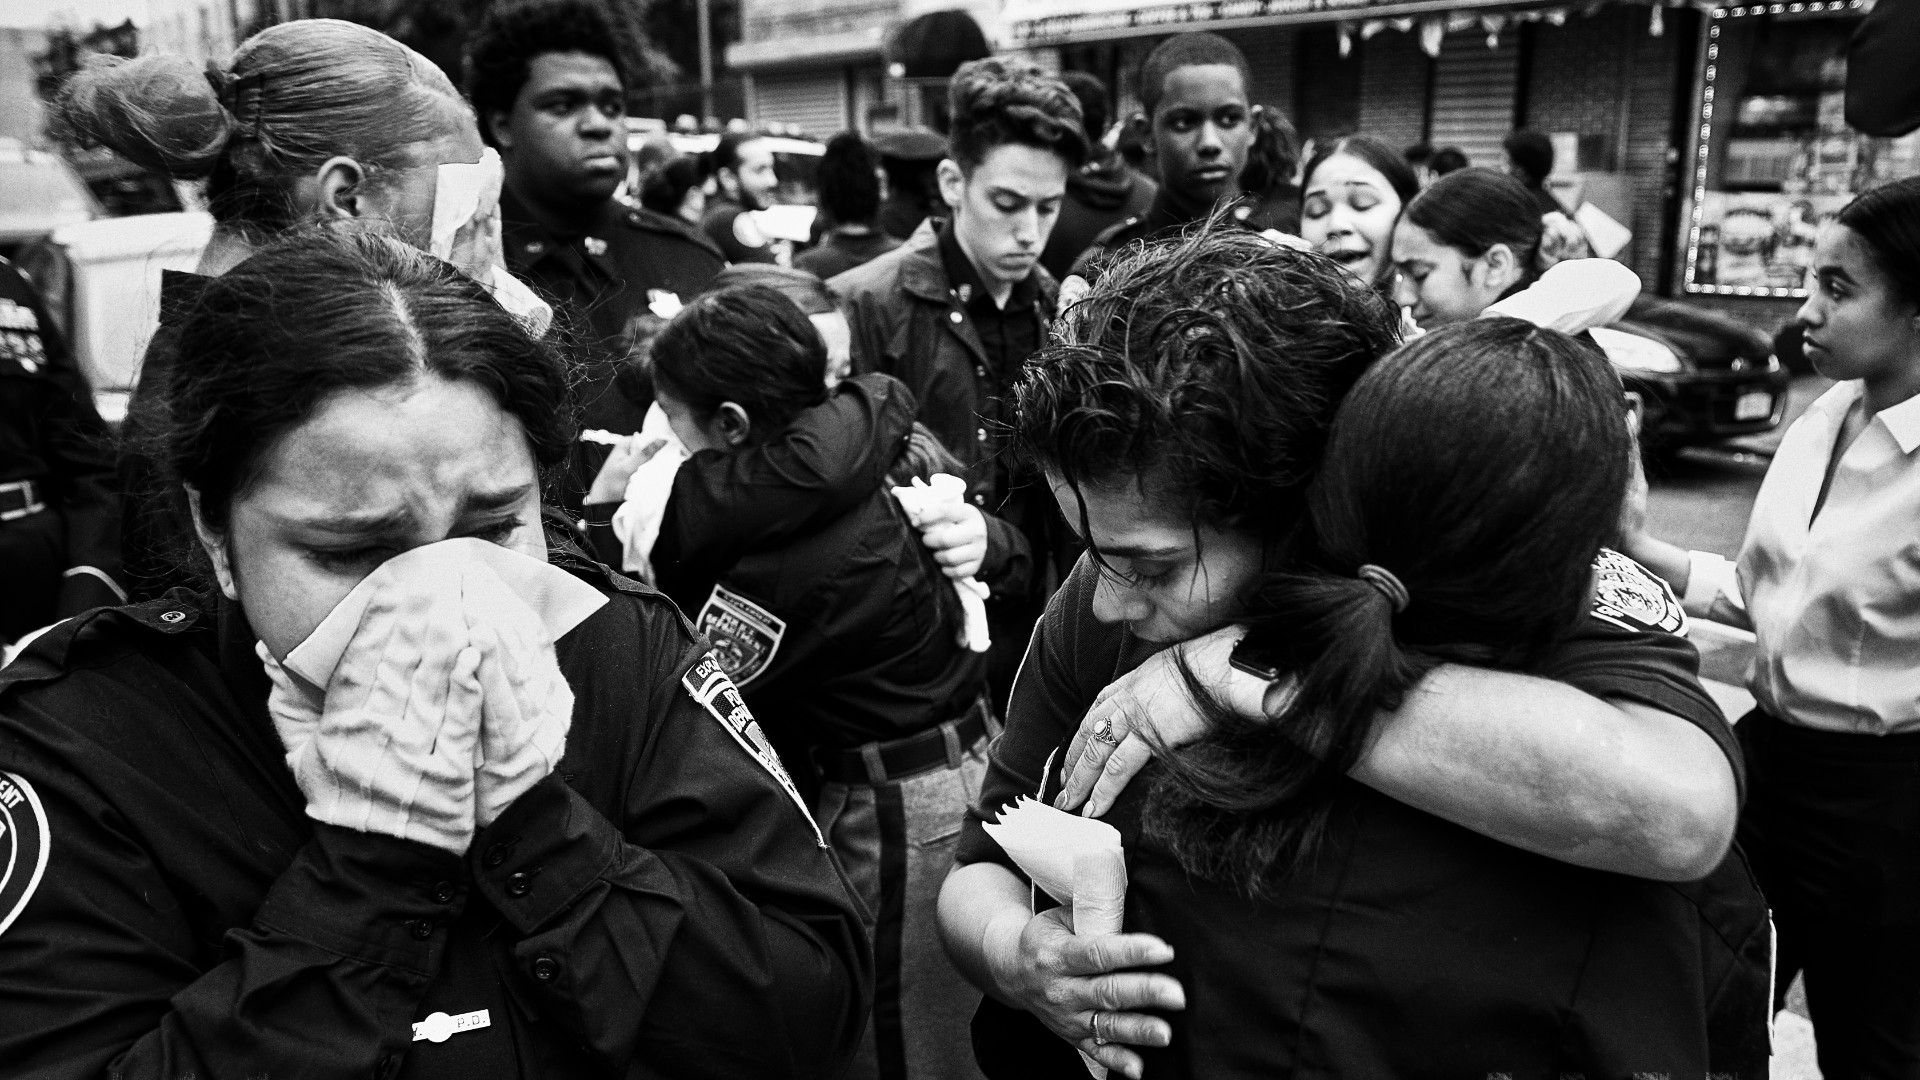 Lesandro Guzman-Feliz Funeral